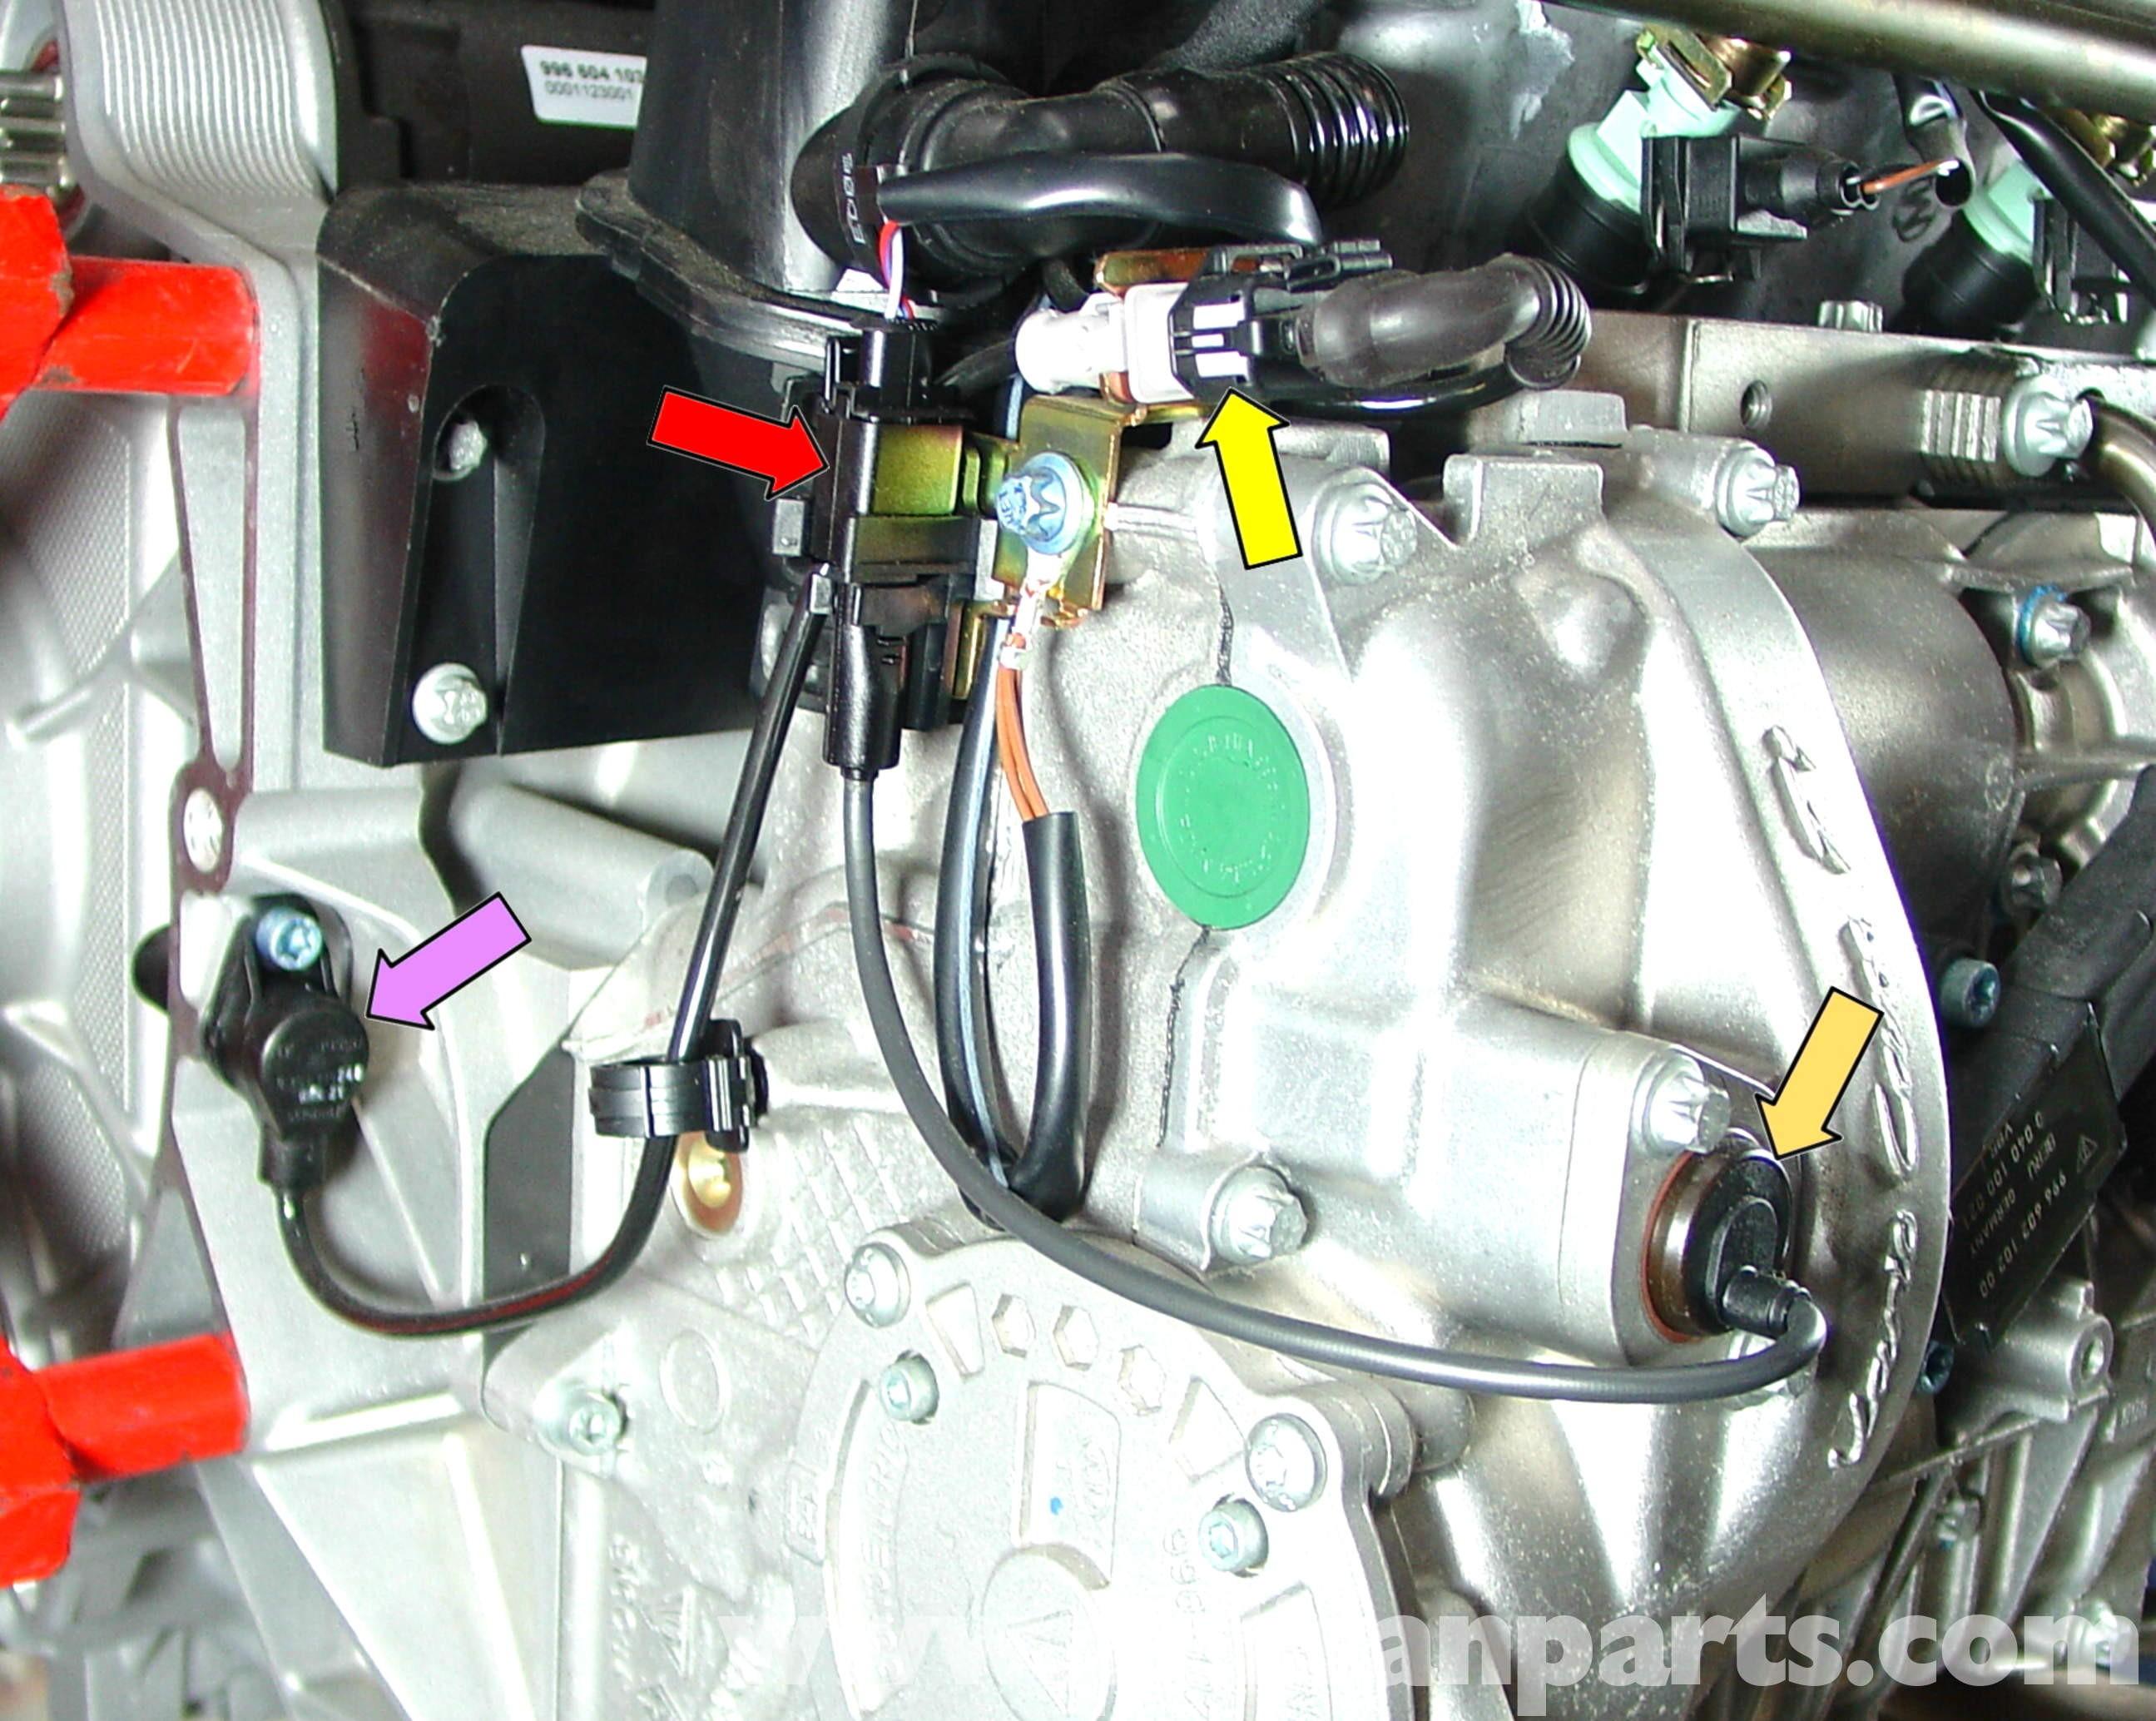 Porsche 911 Engine Diagram 964 Wiring 2005 Fuse Carrera Sensor Replacement 996 1998 Of